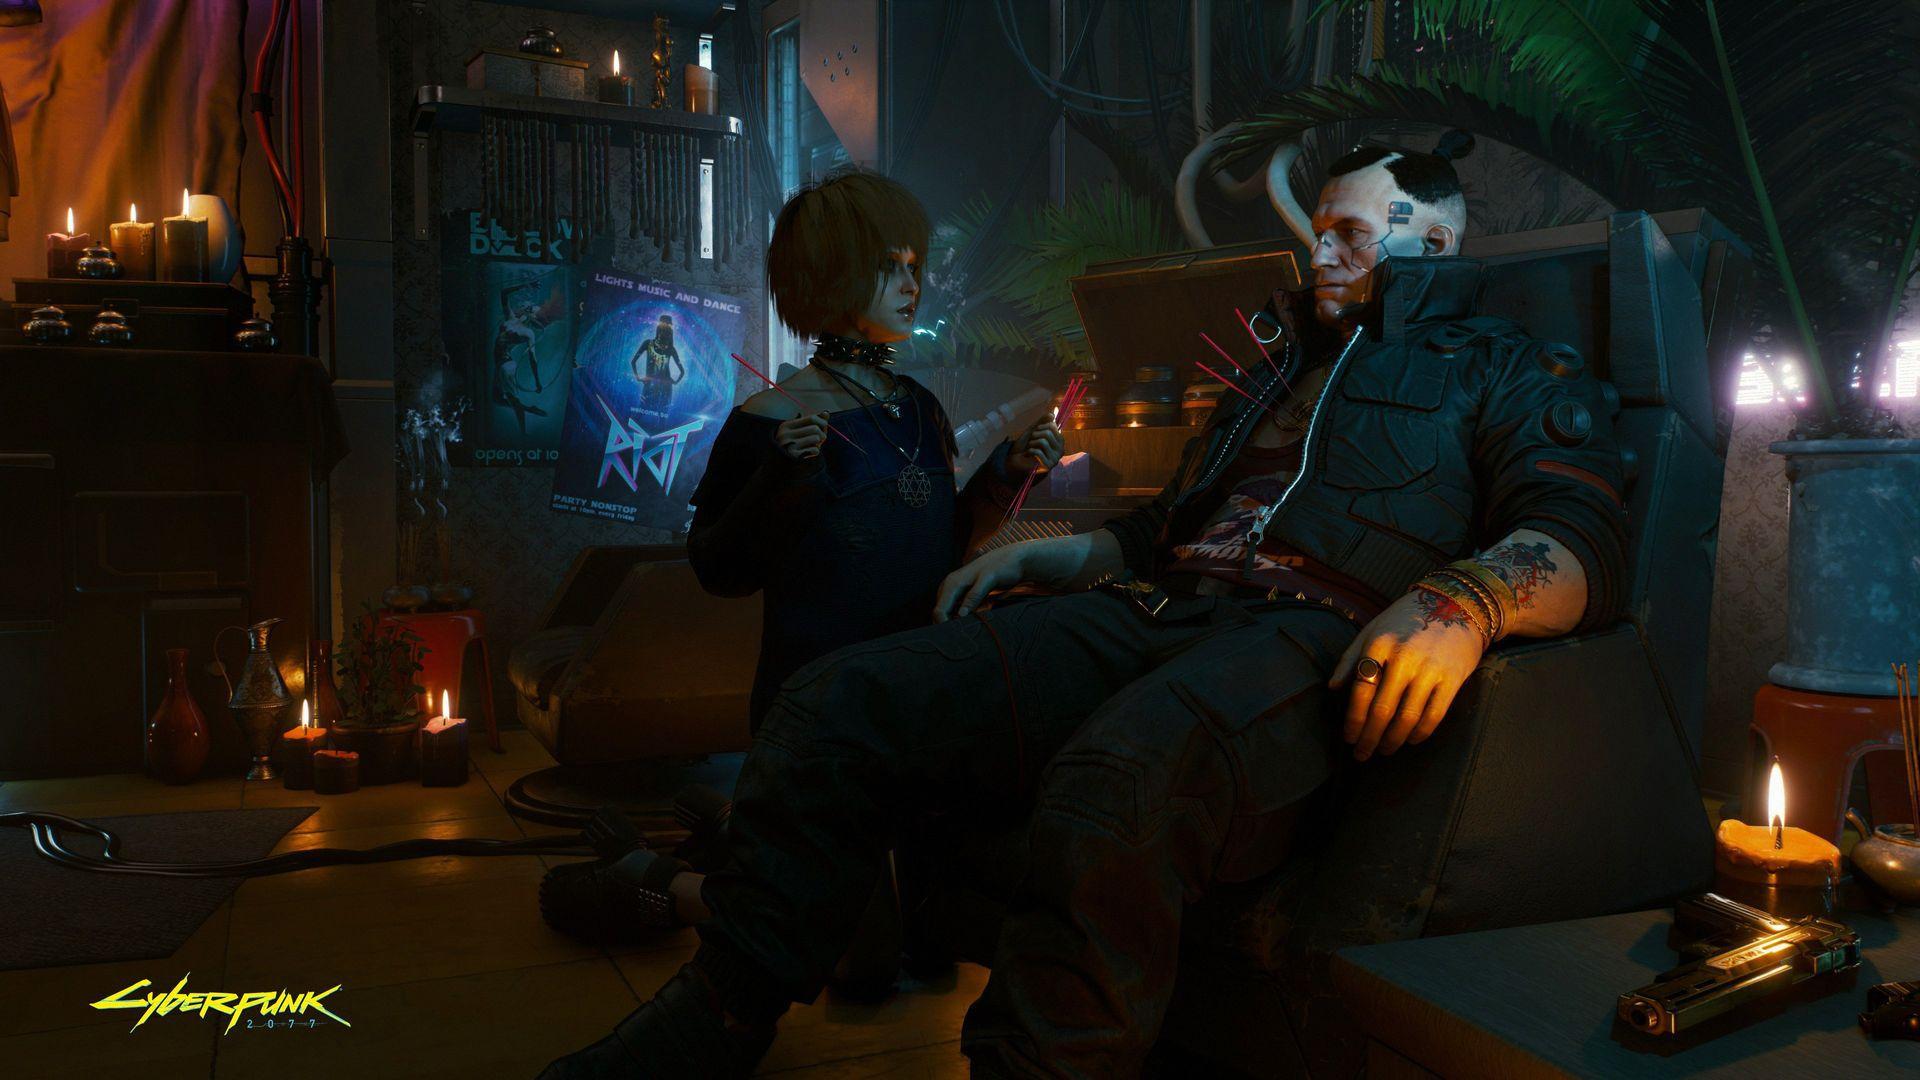 Cyberpunk 2077 Jeu Jeu De Rôles Gamekult